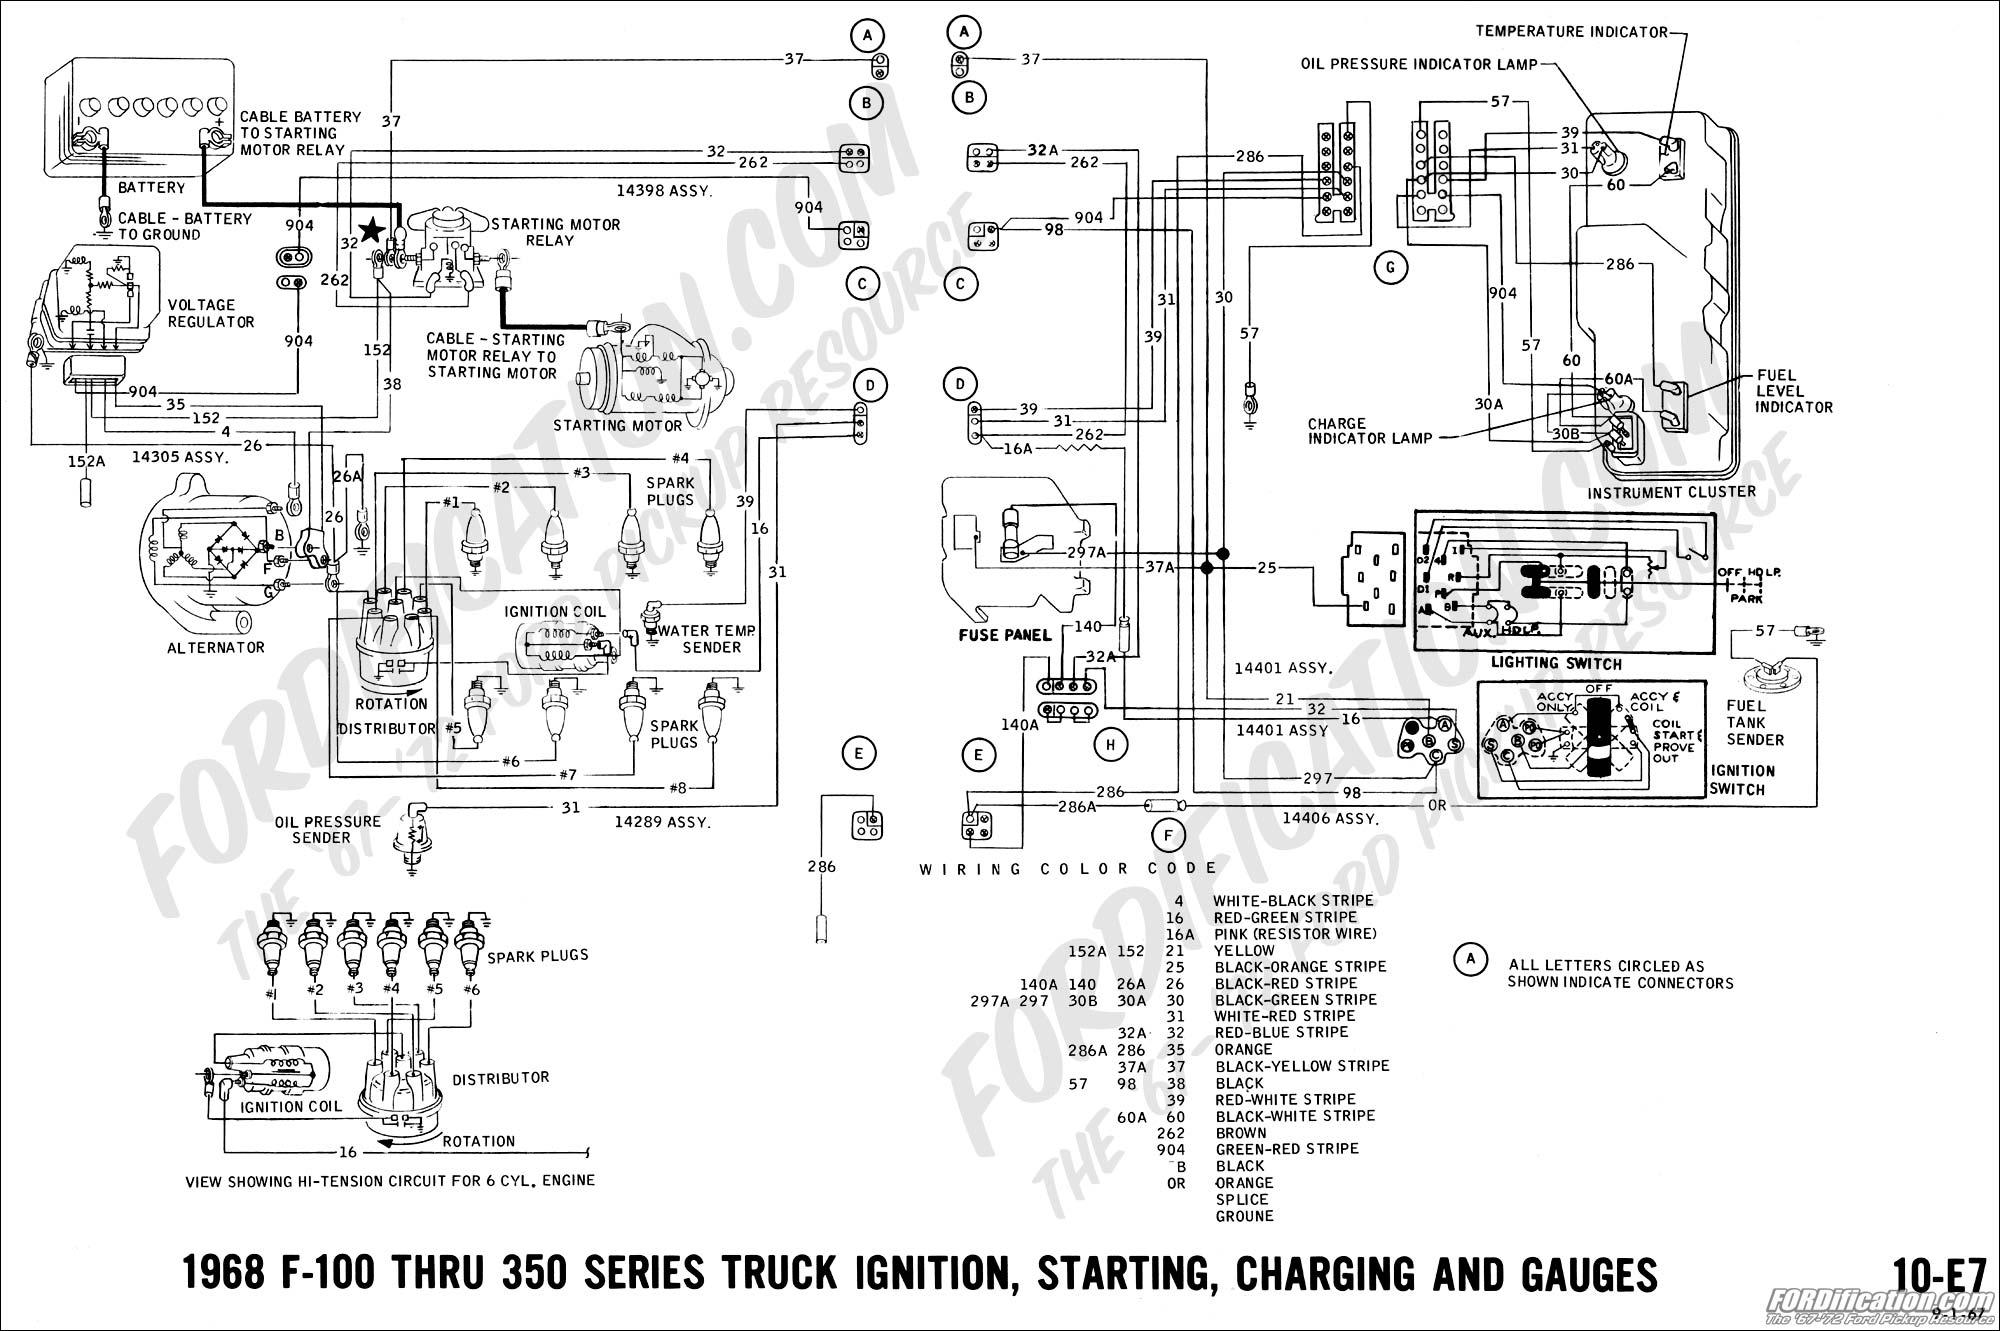 Pleasing 1968 Ford Truck Wiring Diagram Wiring Diagram Data Schema Wiring Cloud Orsalboapumohammedshrineorg